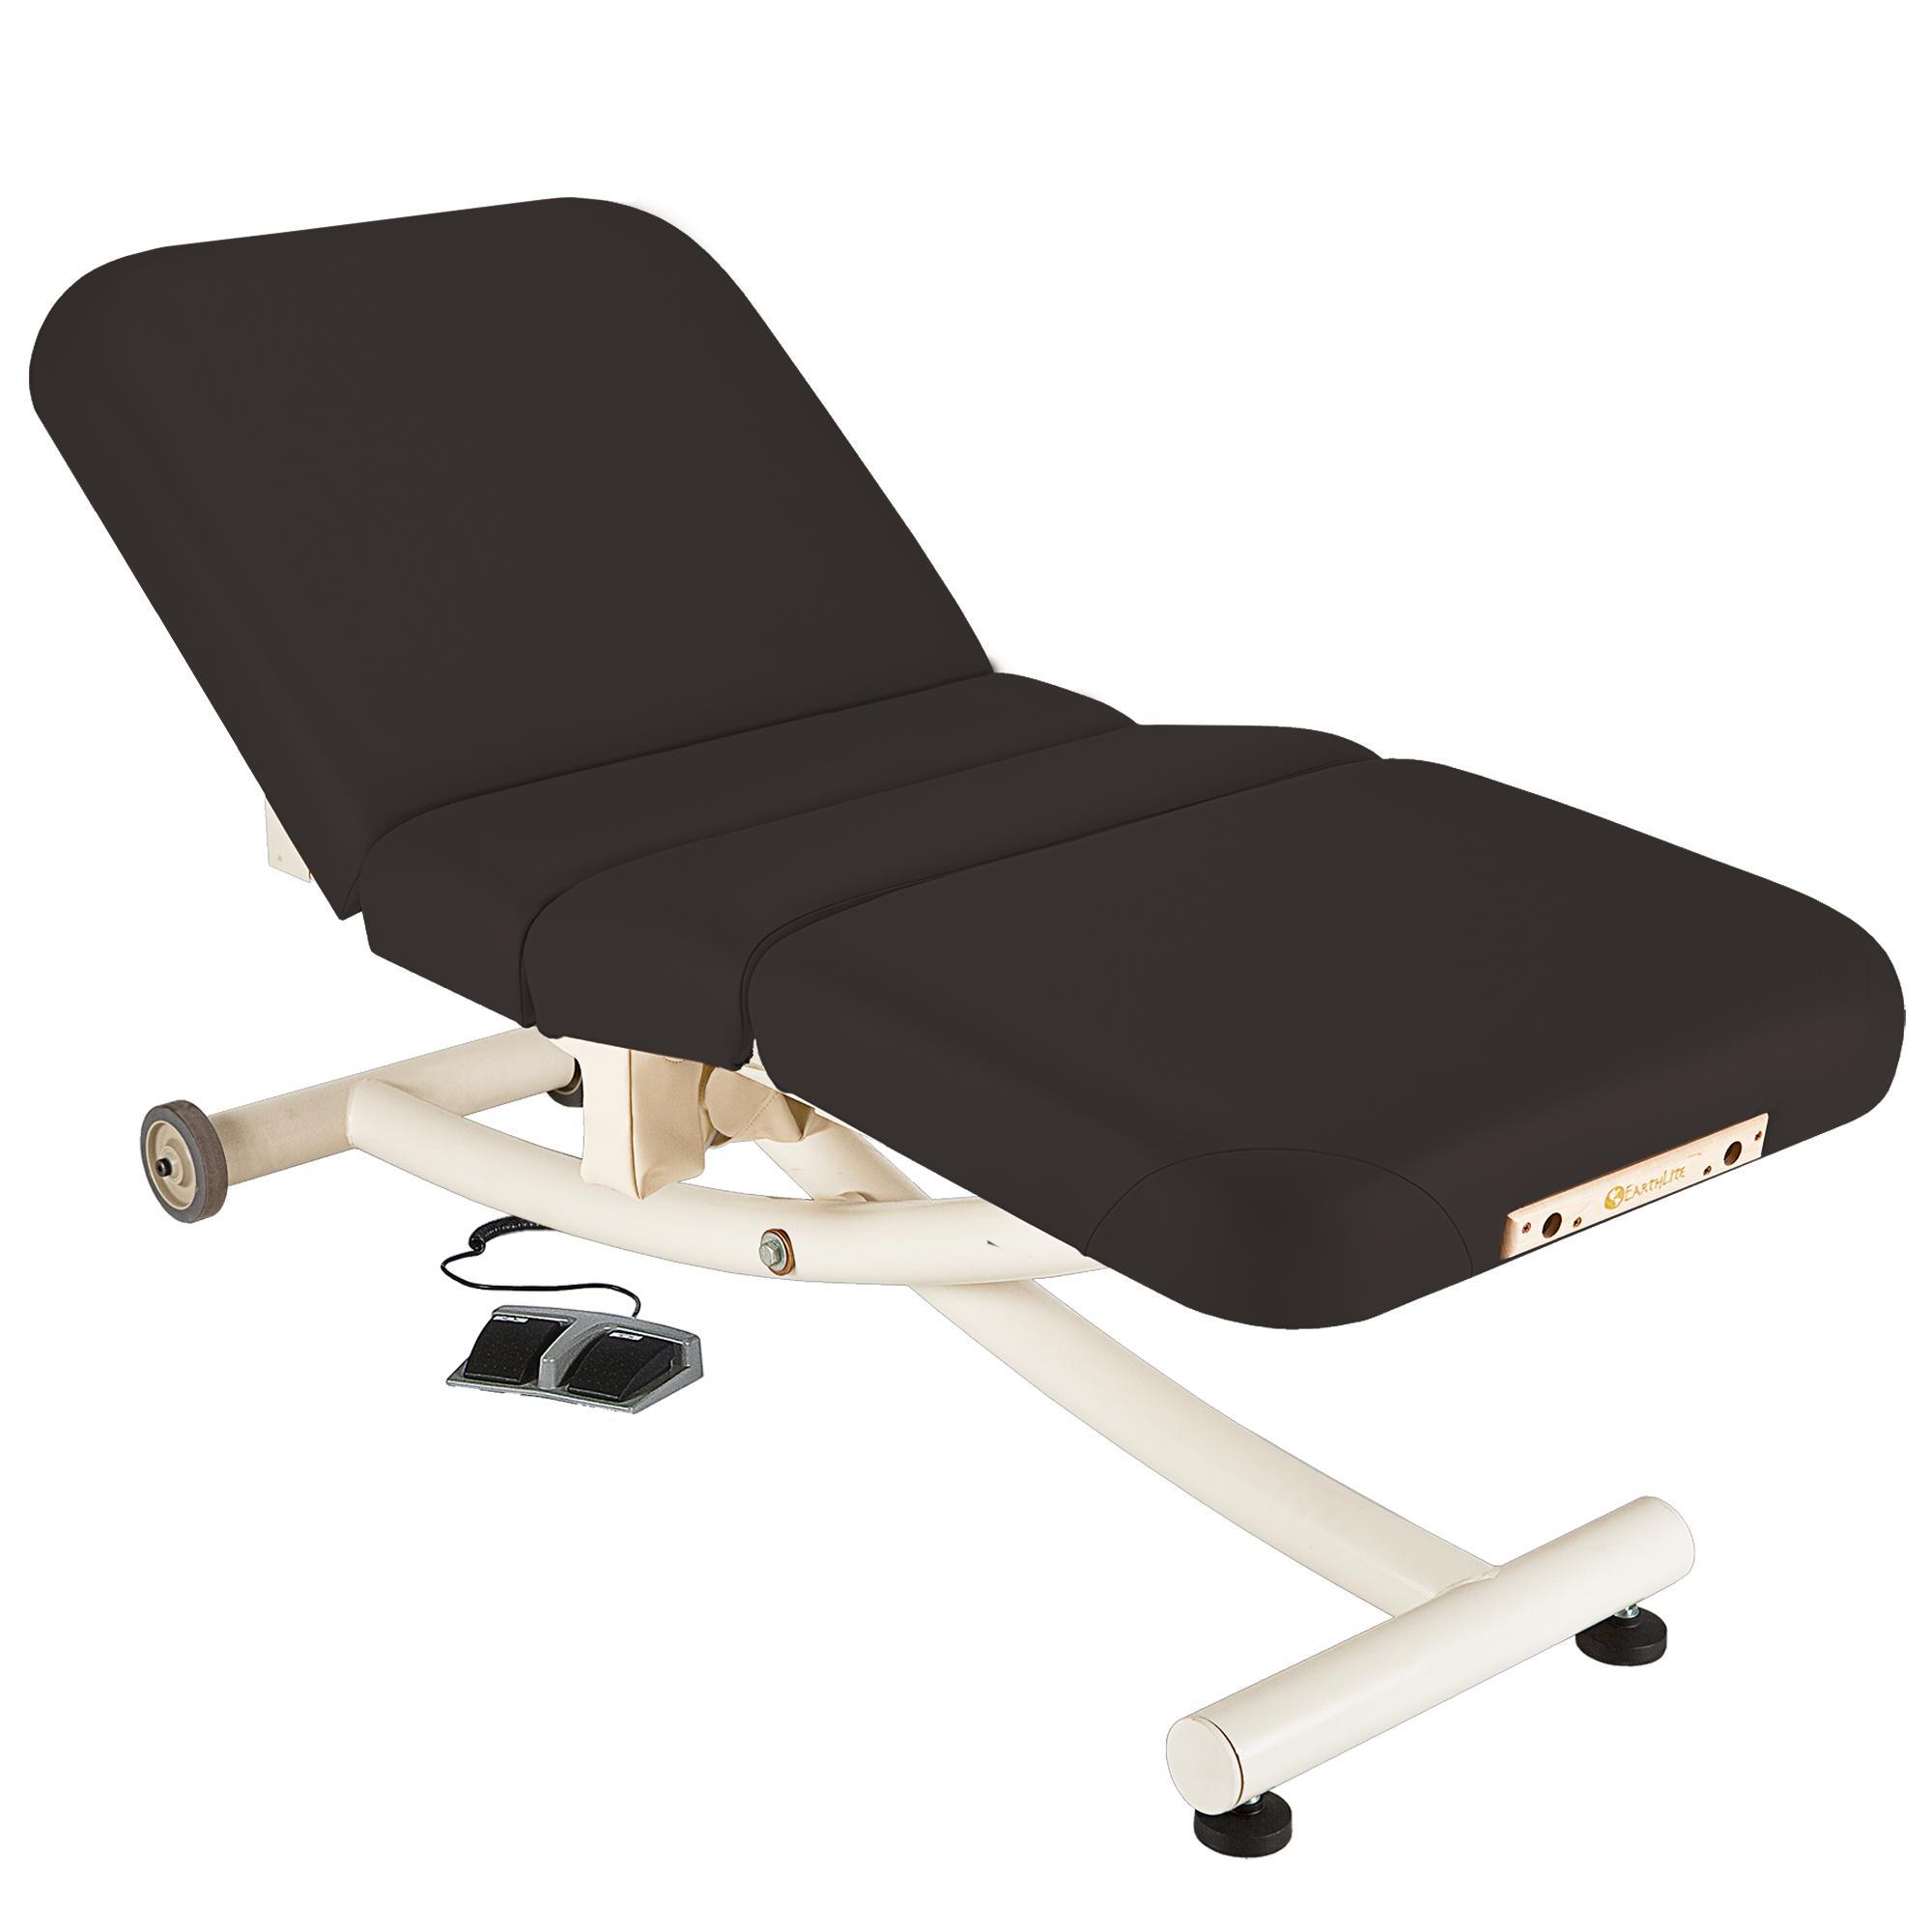 amazon com earthlite electric lift massage table ellora vista rh amazon com hydraulic massage table for sale used hydraulic massage table canada